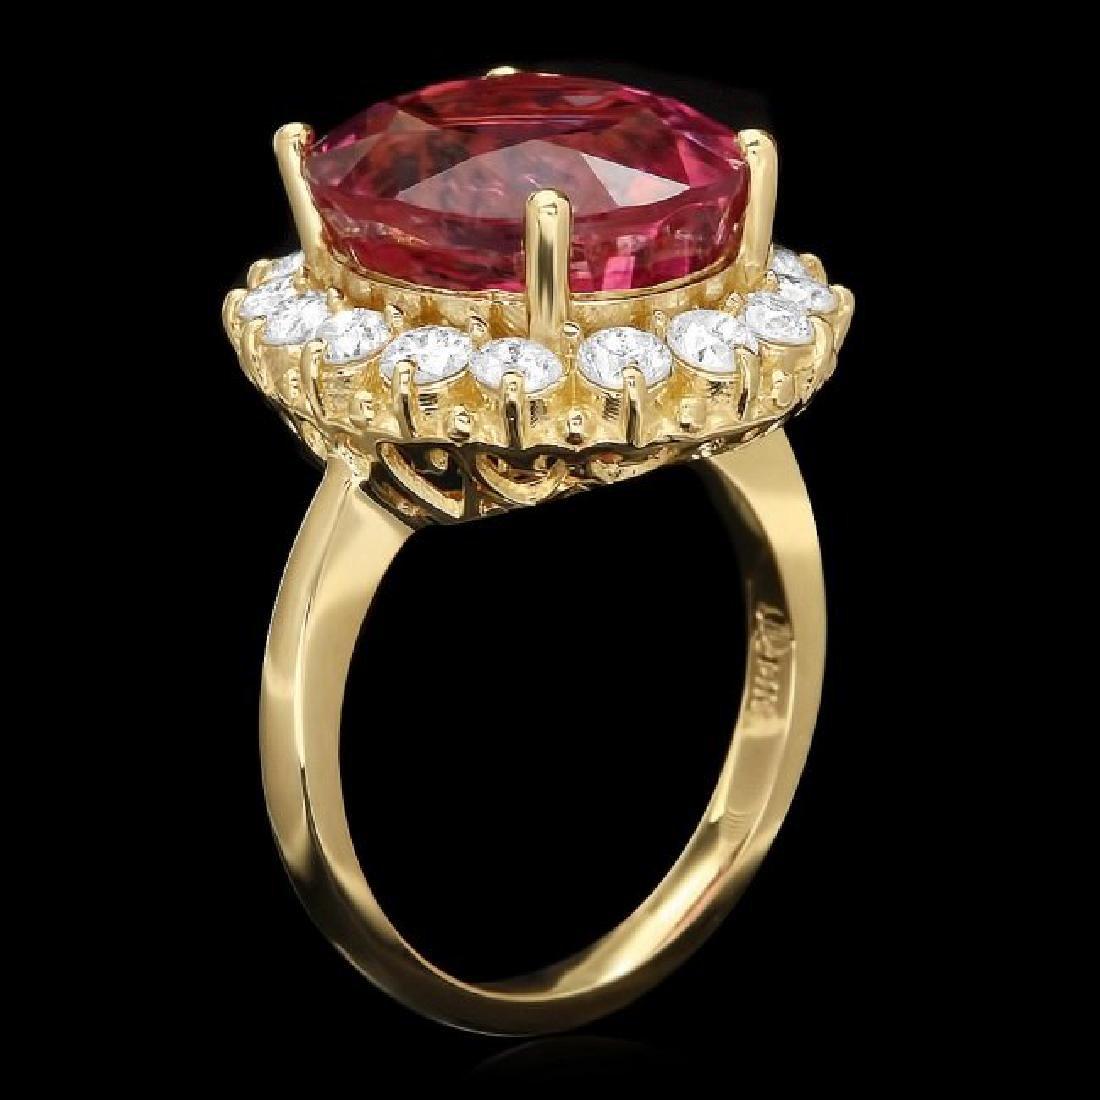 14k Gold 10.50ct Tourmaline 1.50ct Diamond Ring - 2